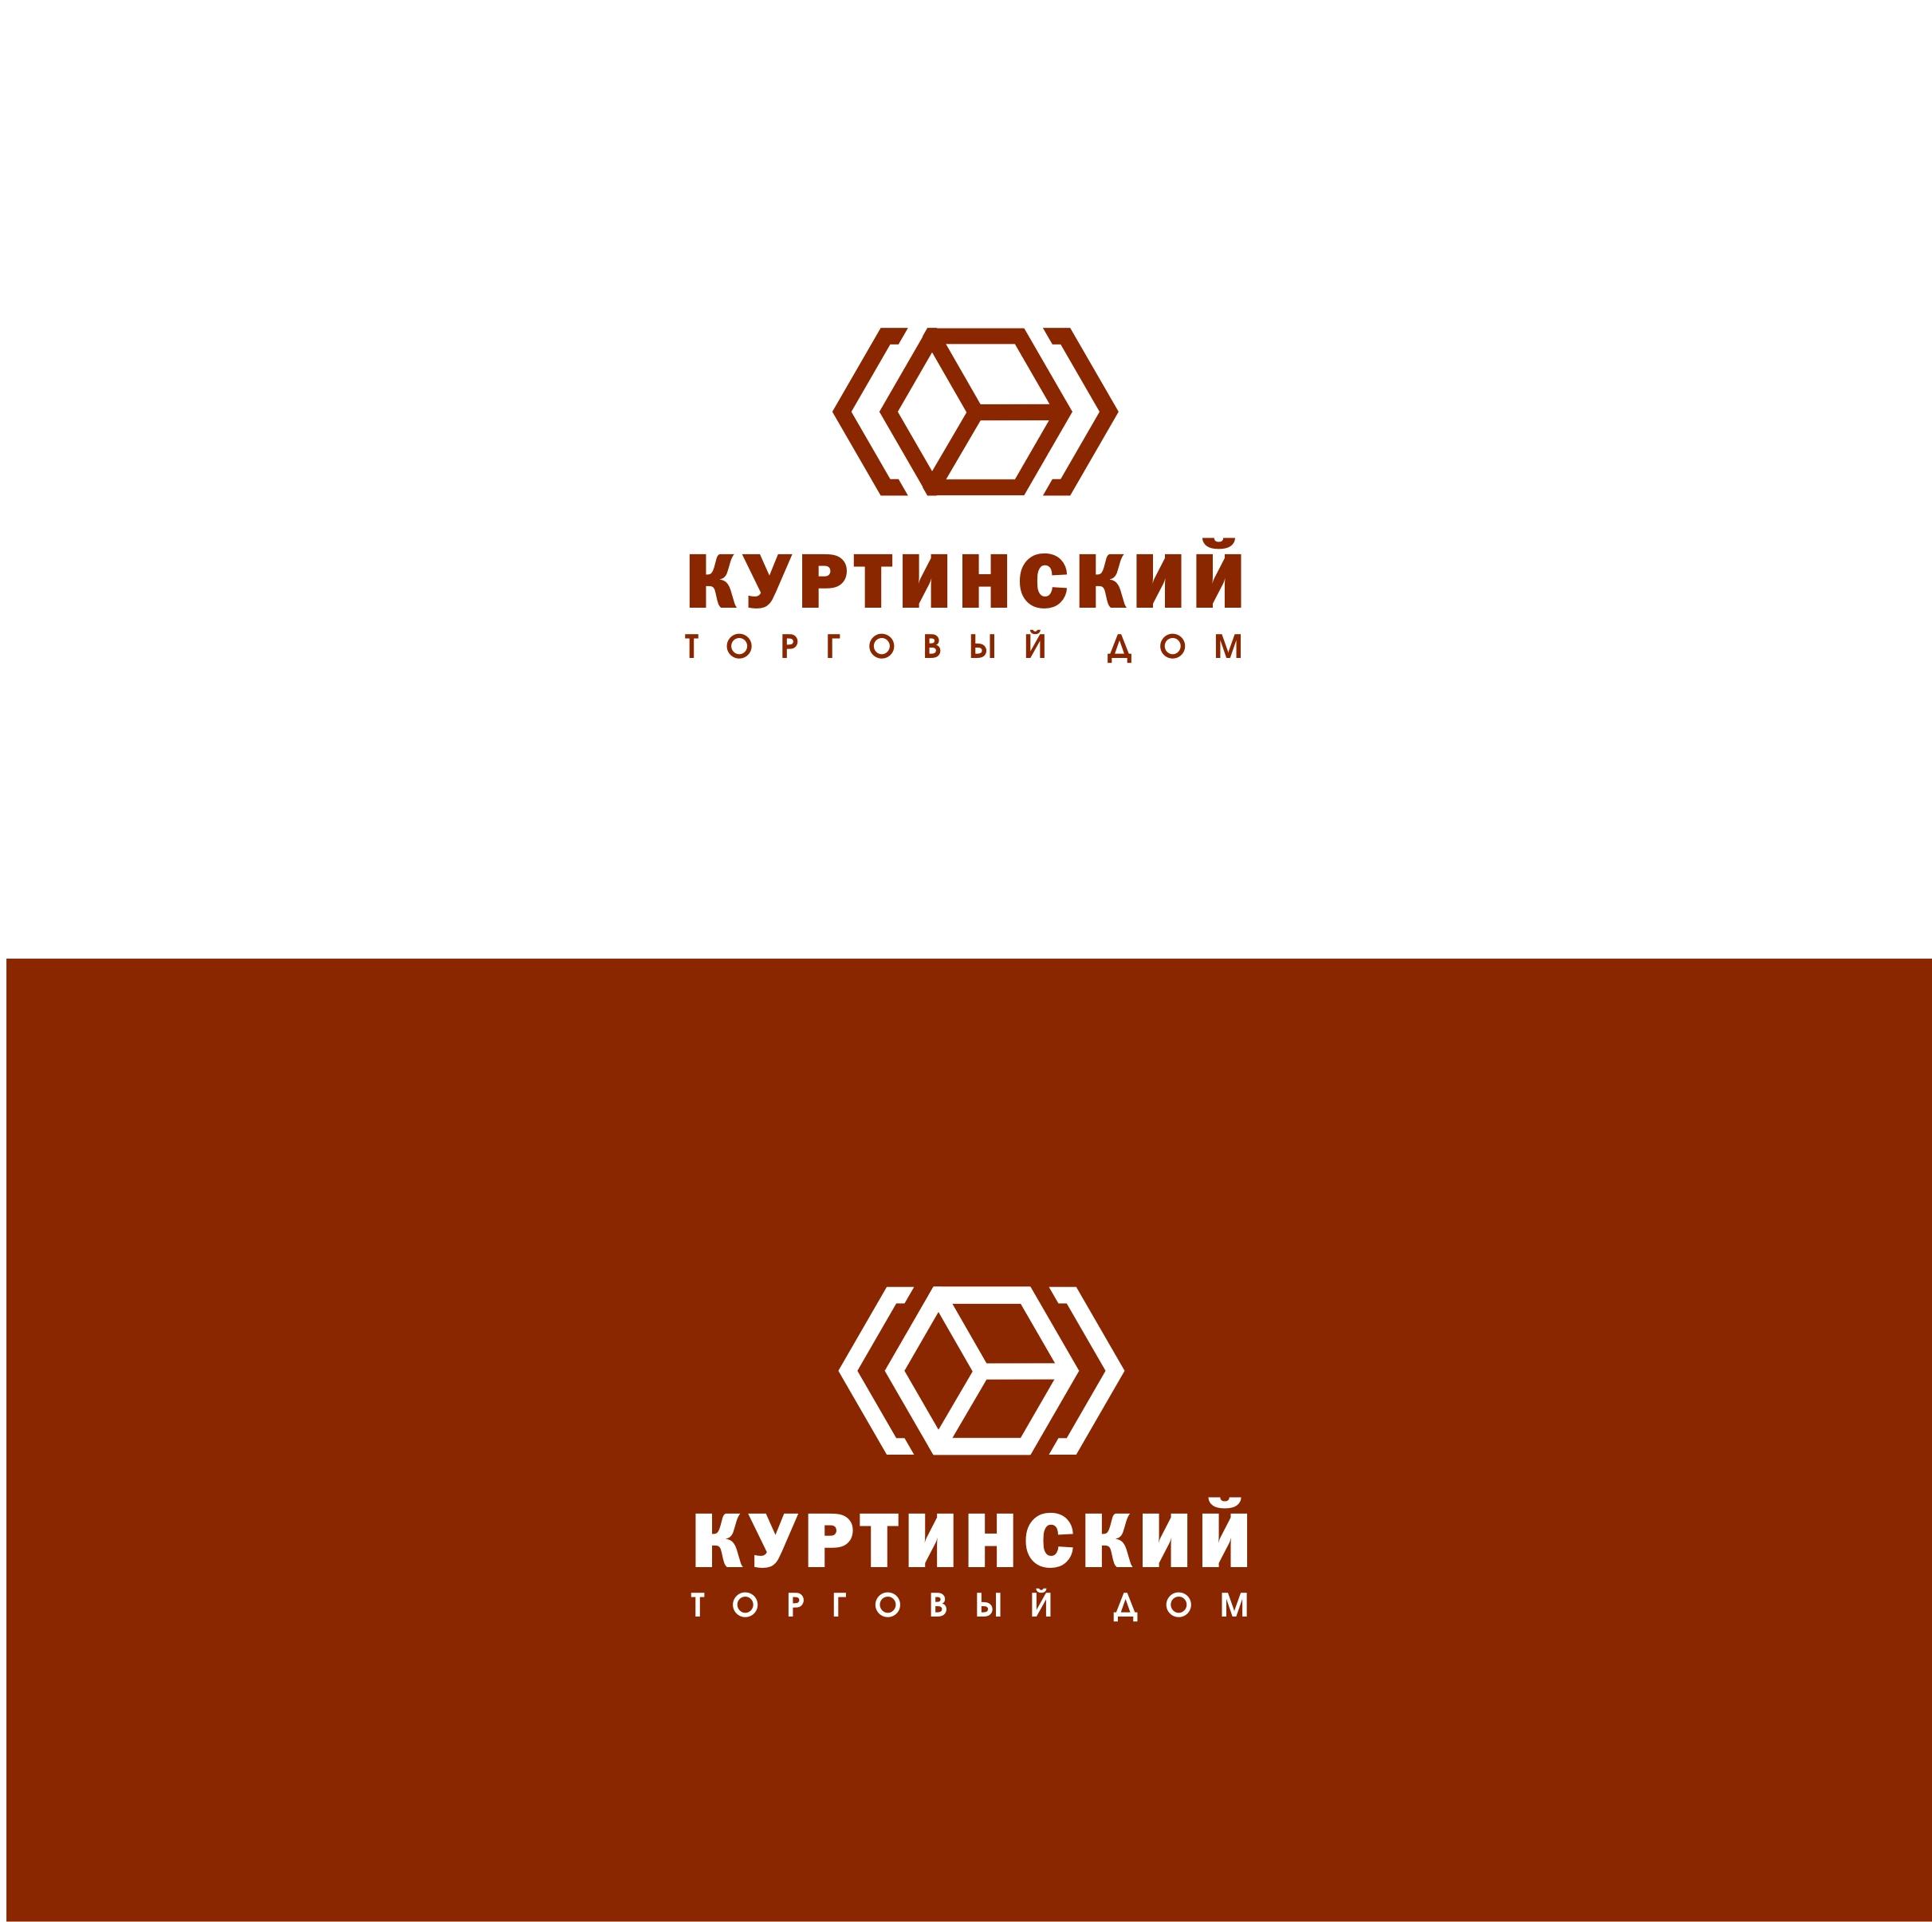 Логотип для камнедобывающей компании фото f_8955b9a4fae9665e.jpg